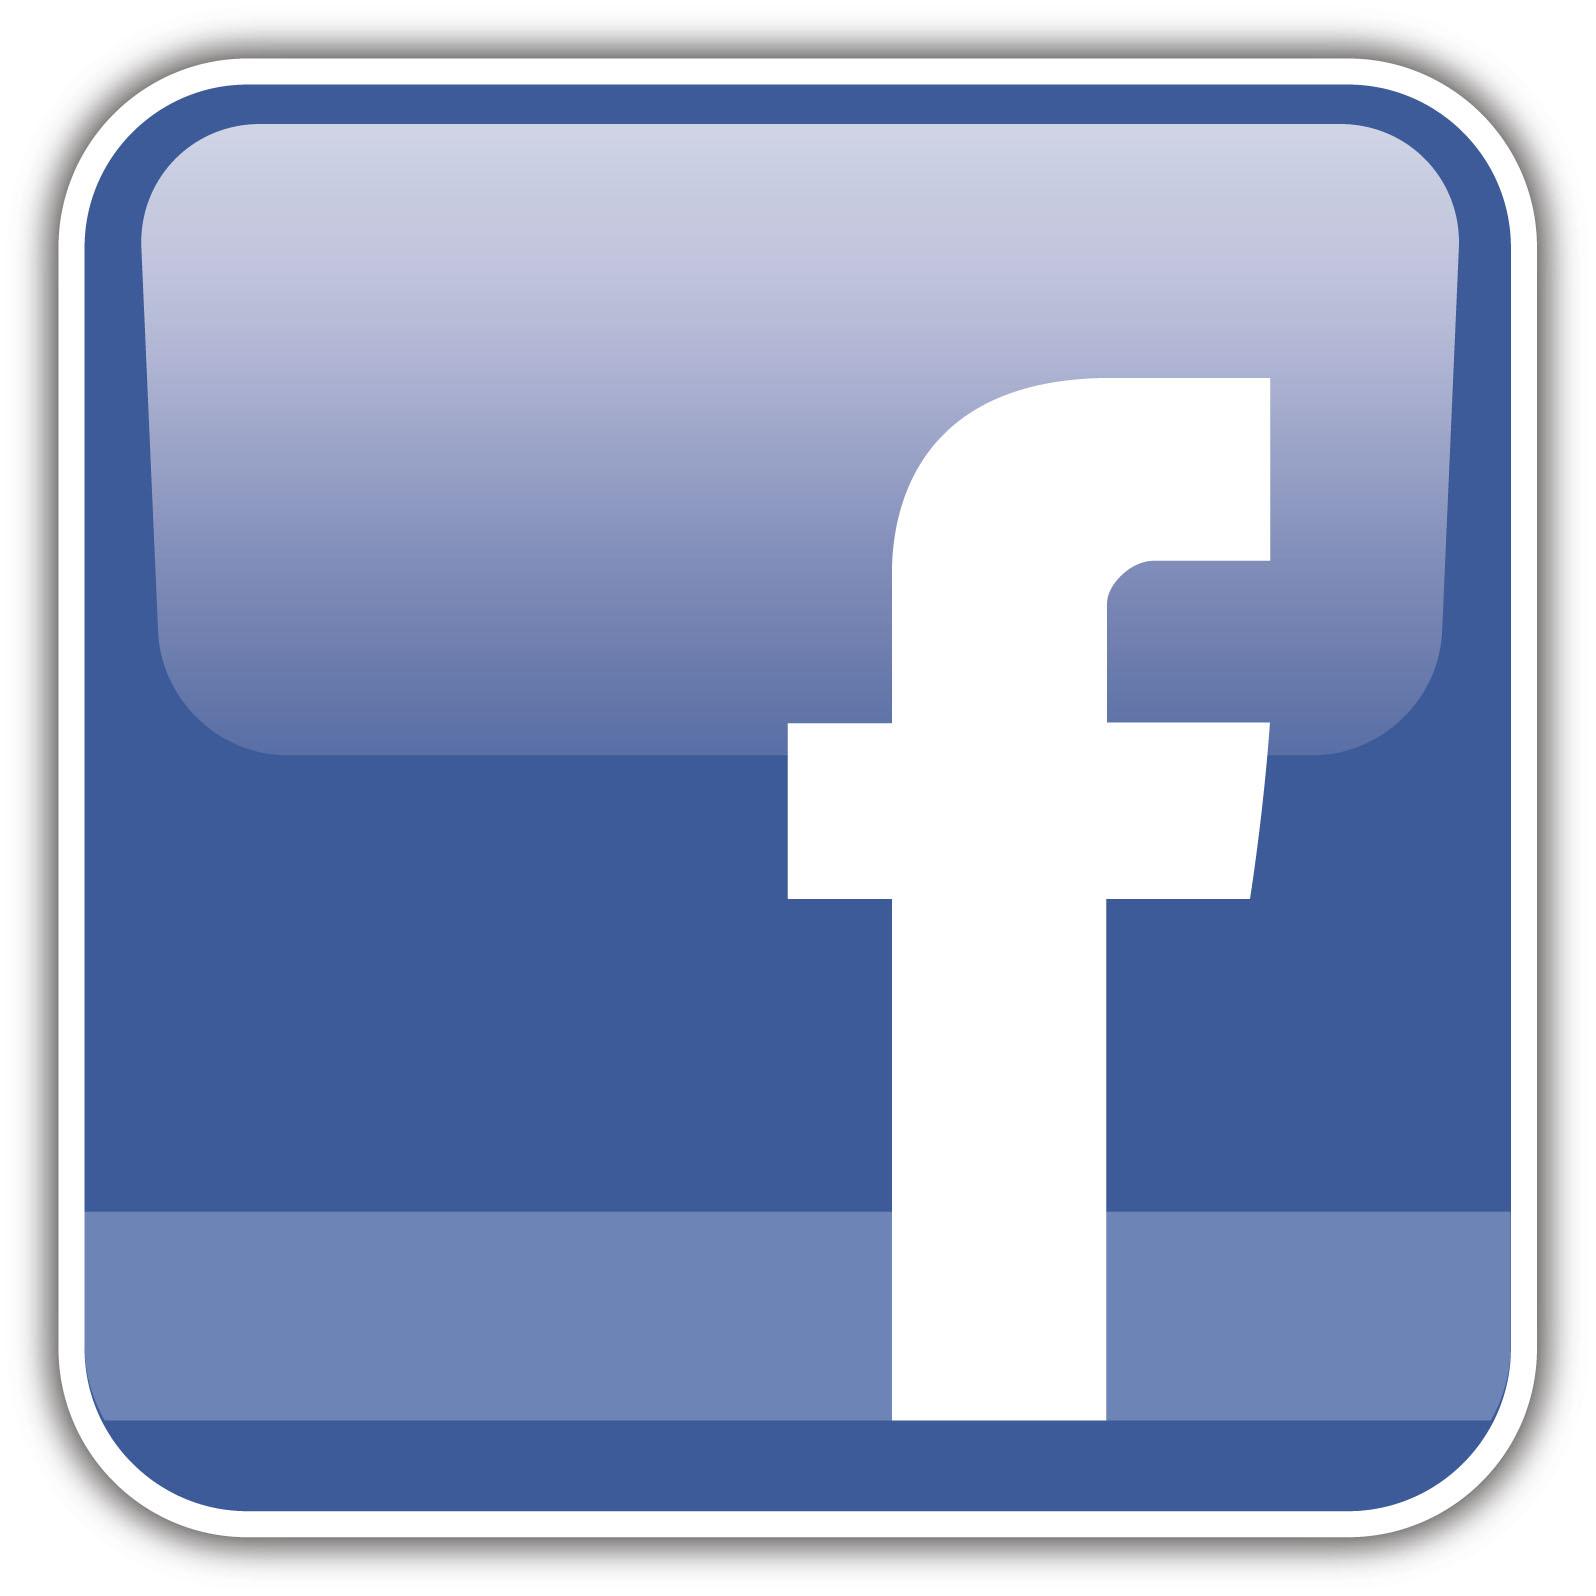 Facebook_icon